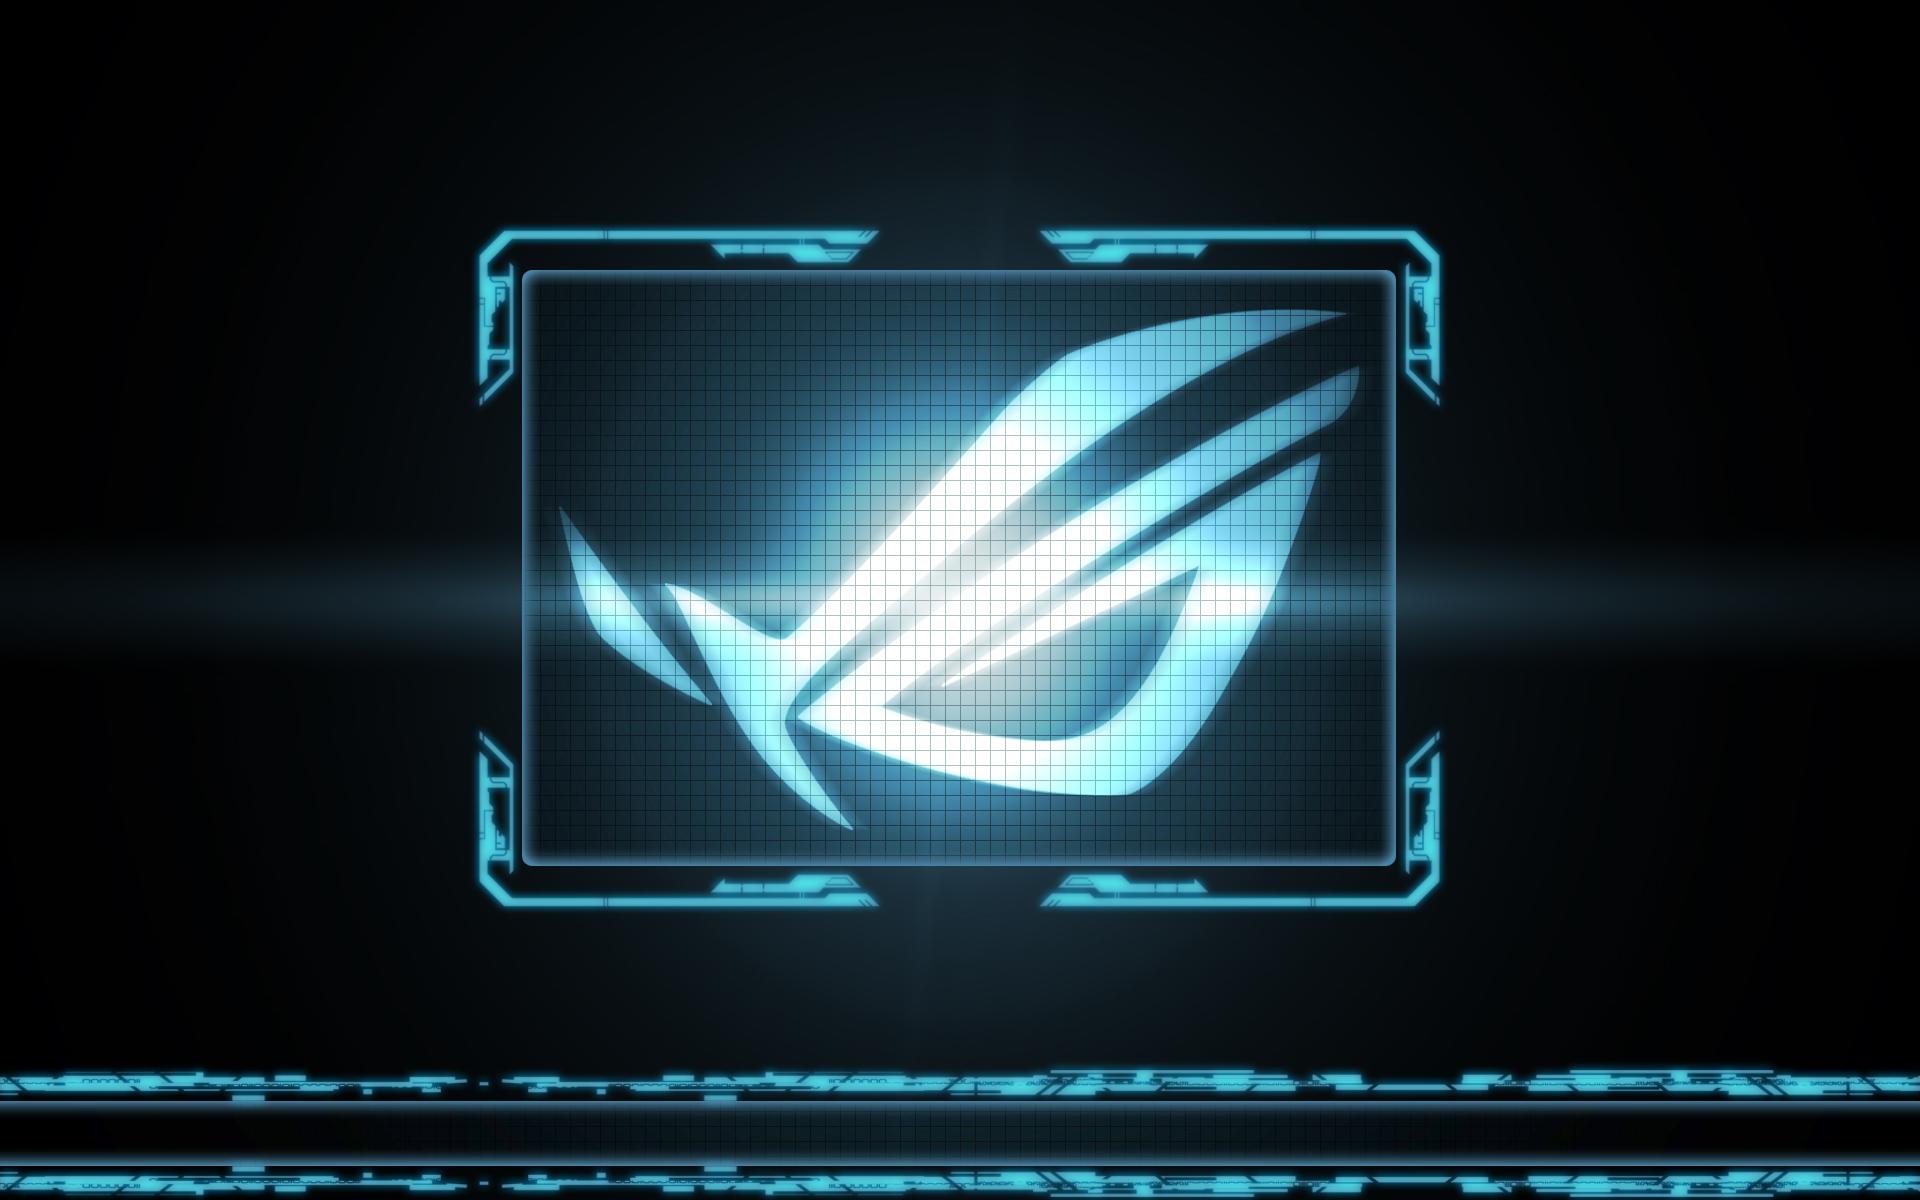 Rog Windows 7 Logon By Ultimatedesktops On Deviantart